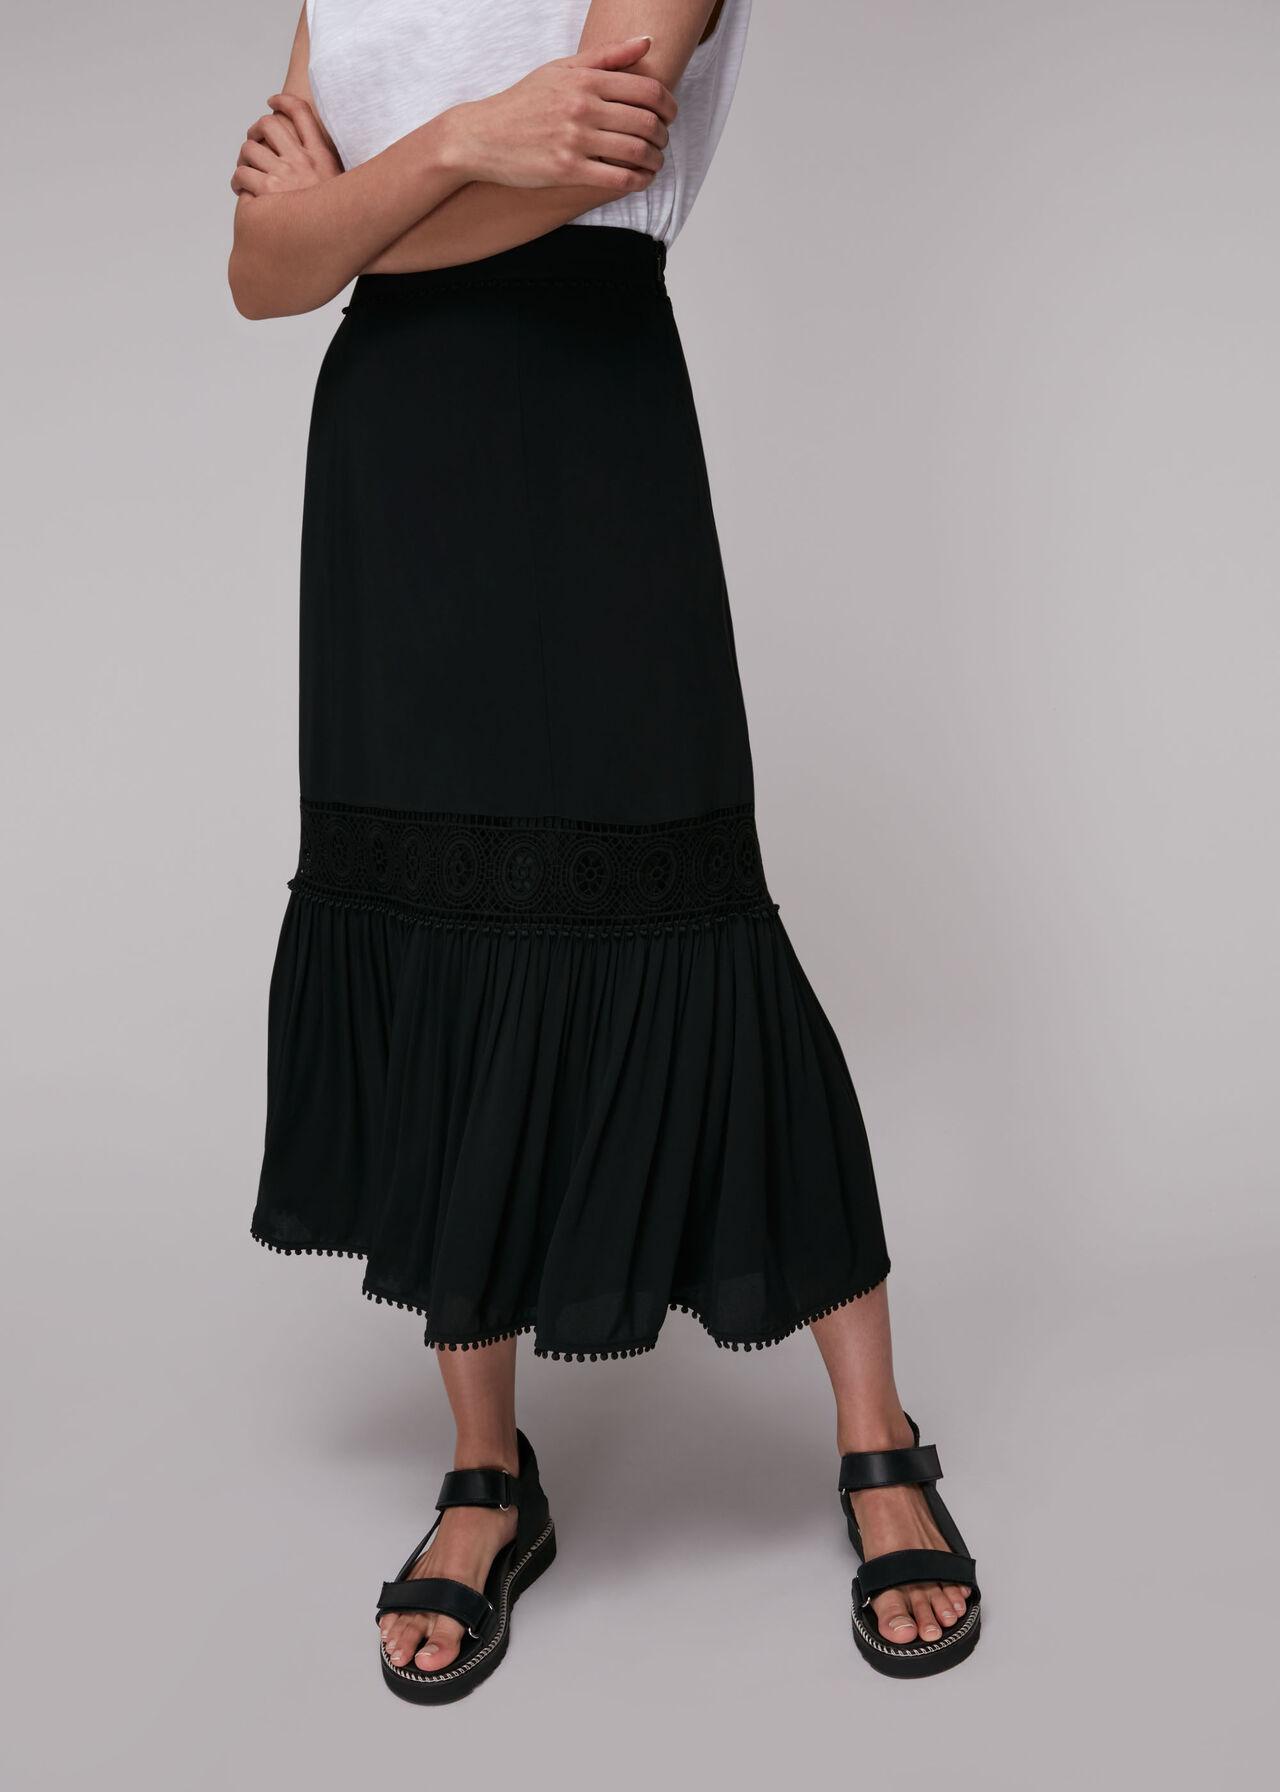 Ada Crochet Detail Skirt